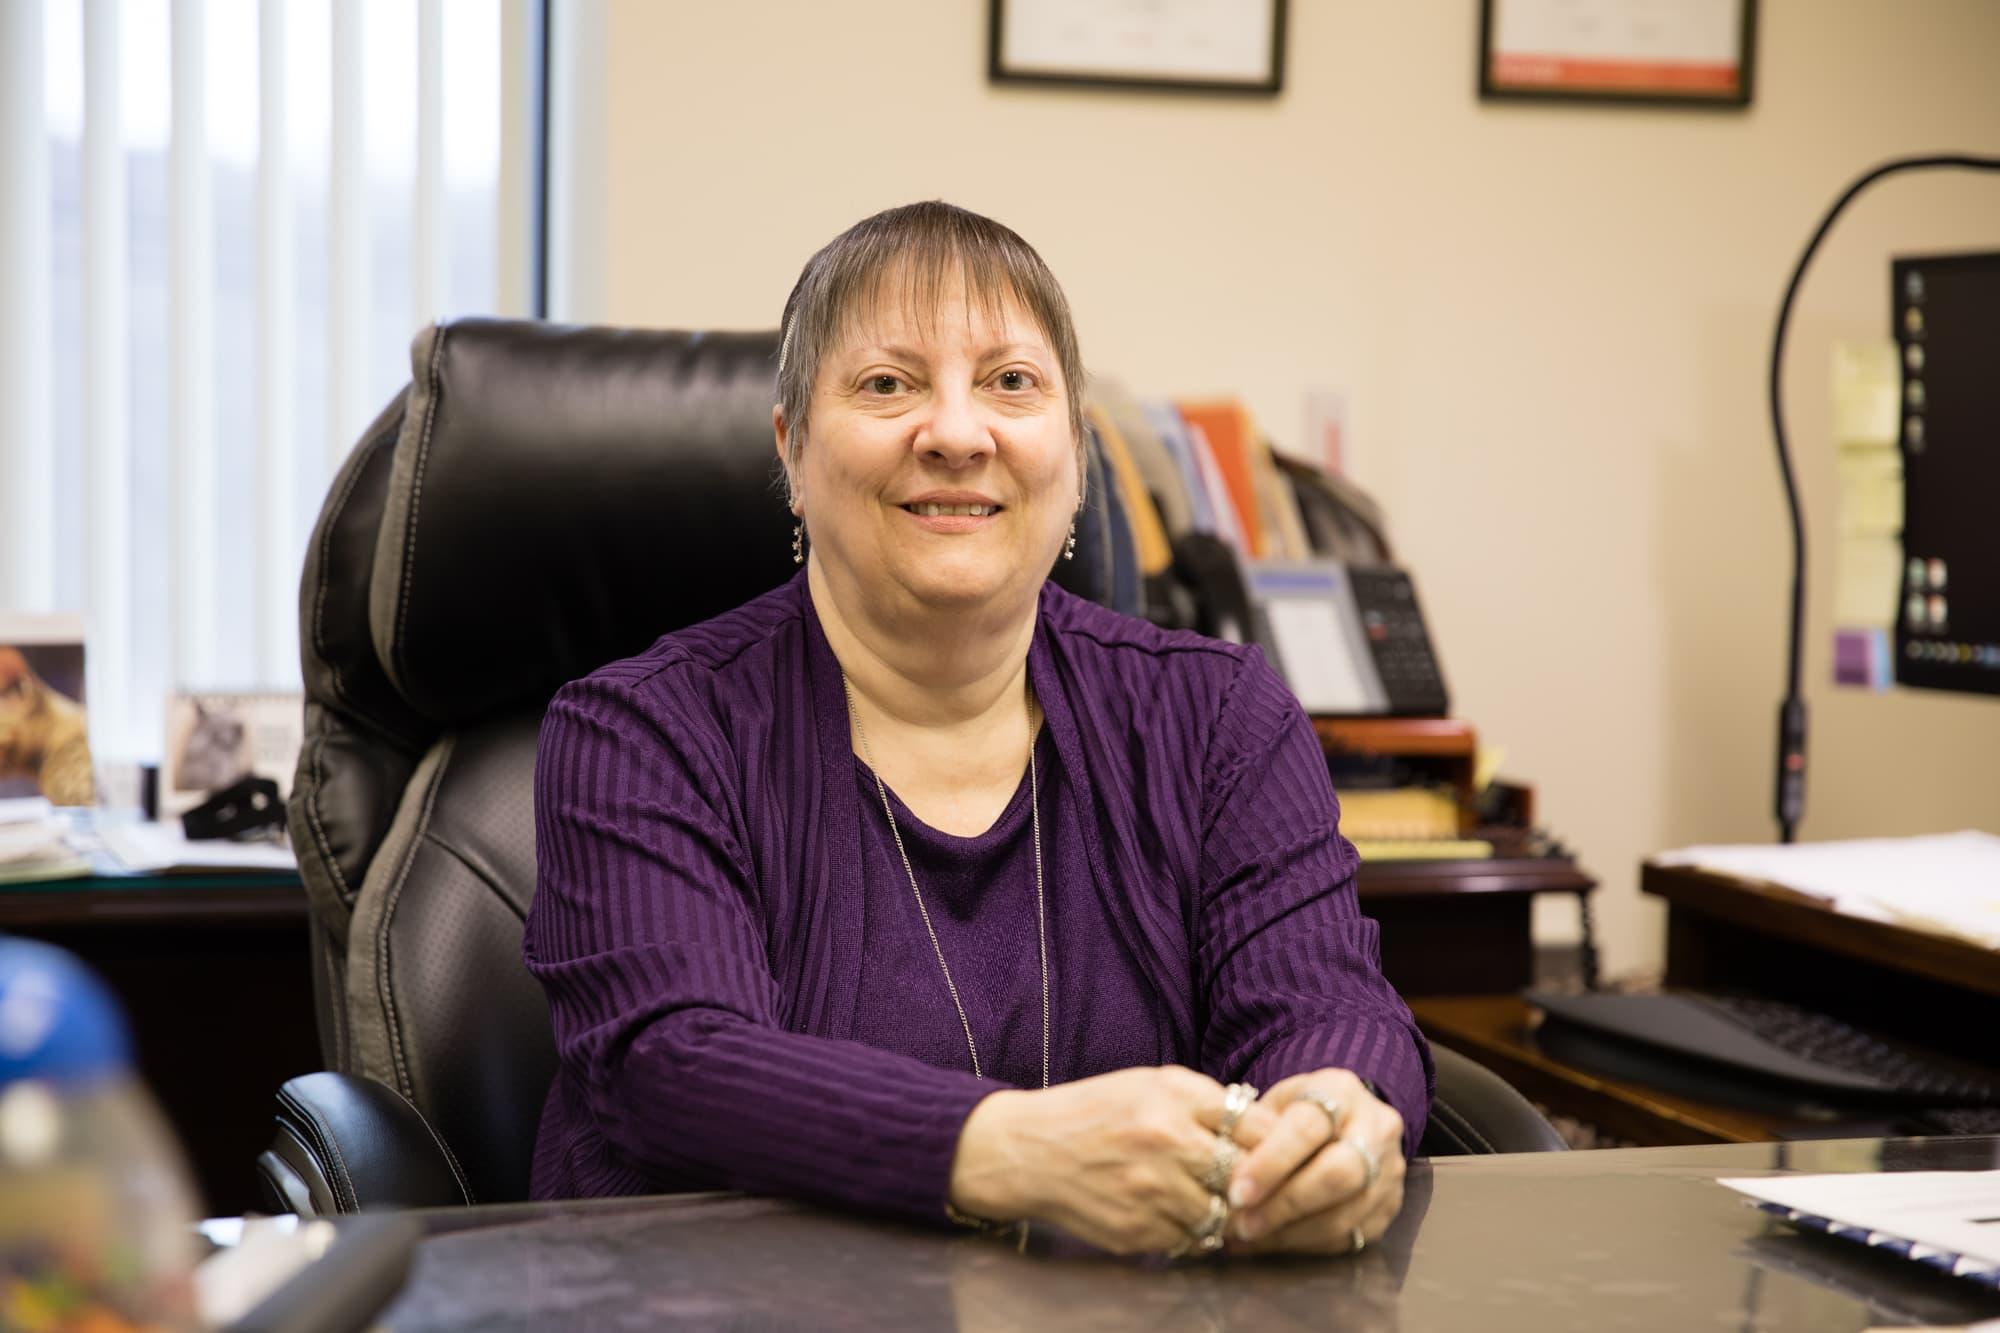 Diana K. Williams - Senior Supervising Accountant